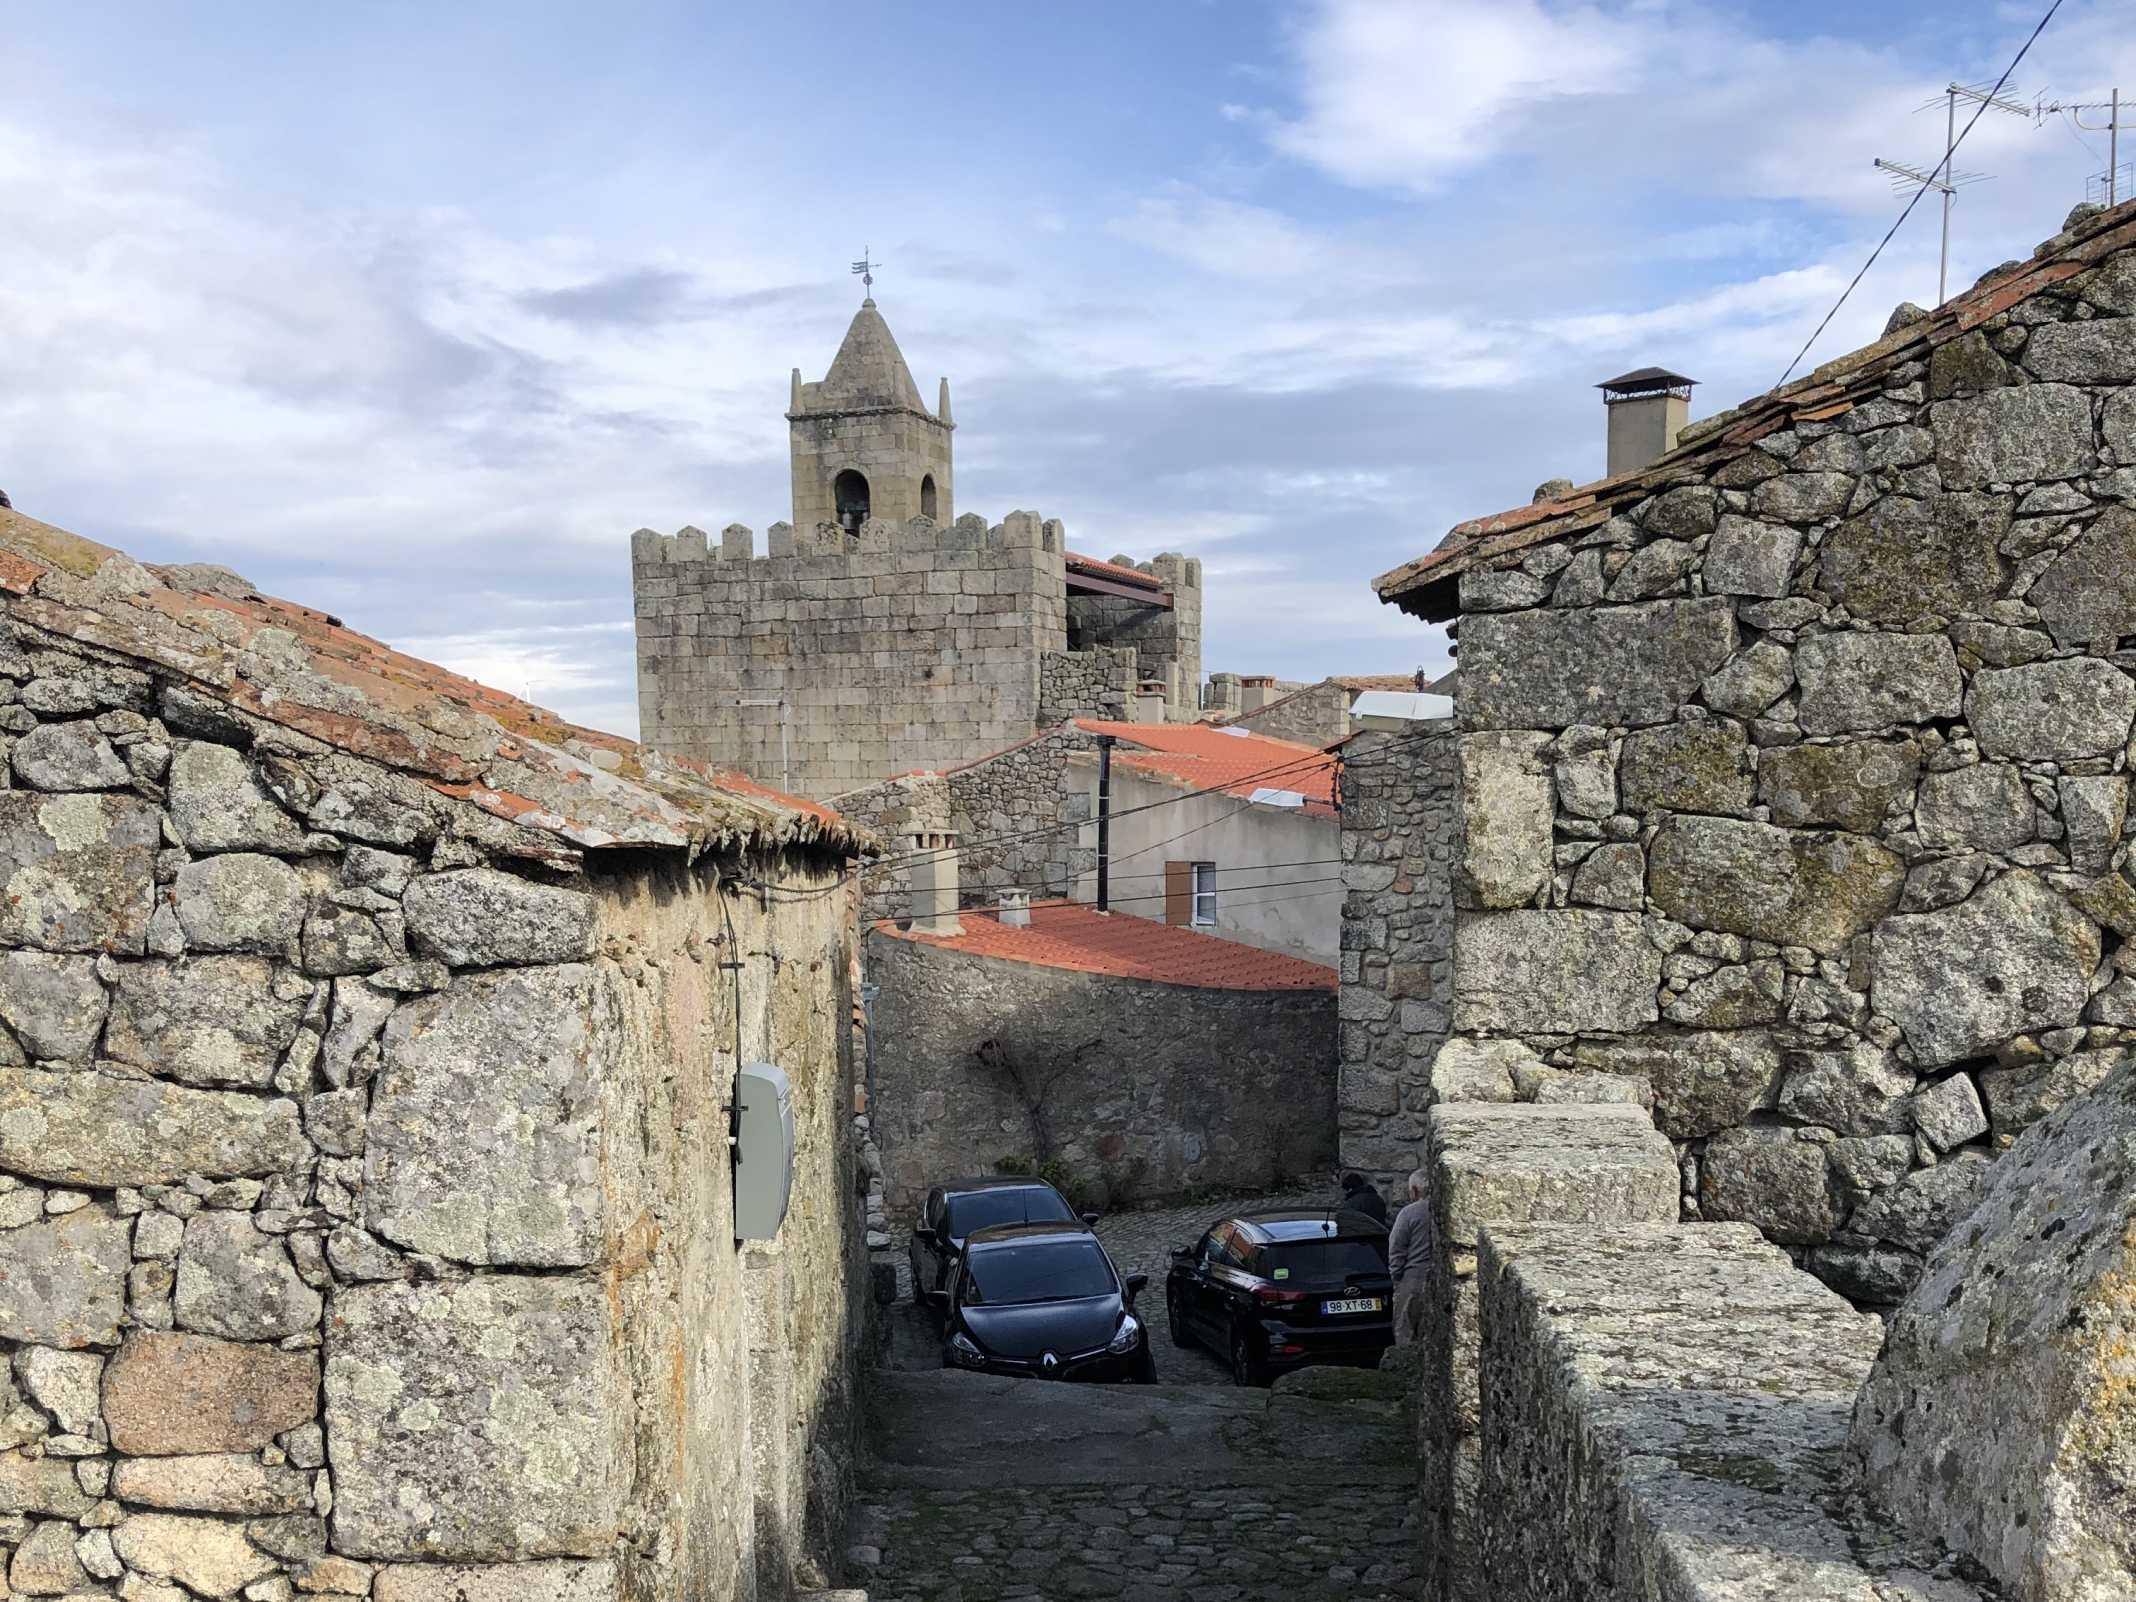 Castelo Penamacor